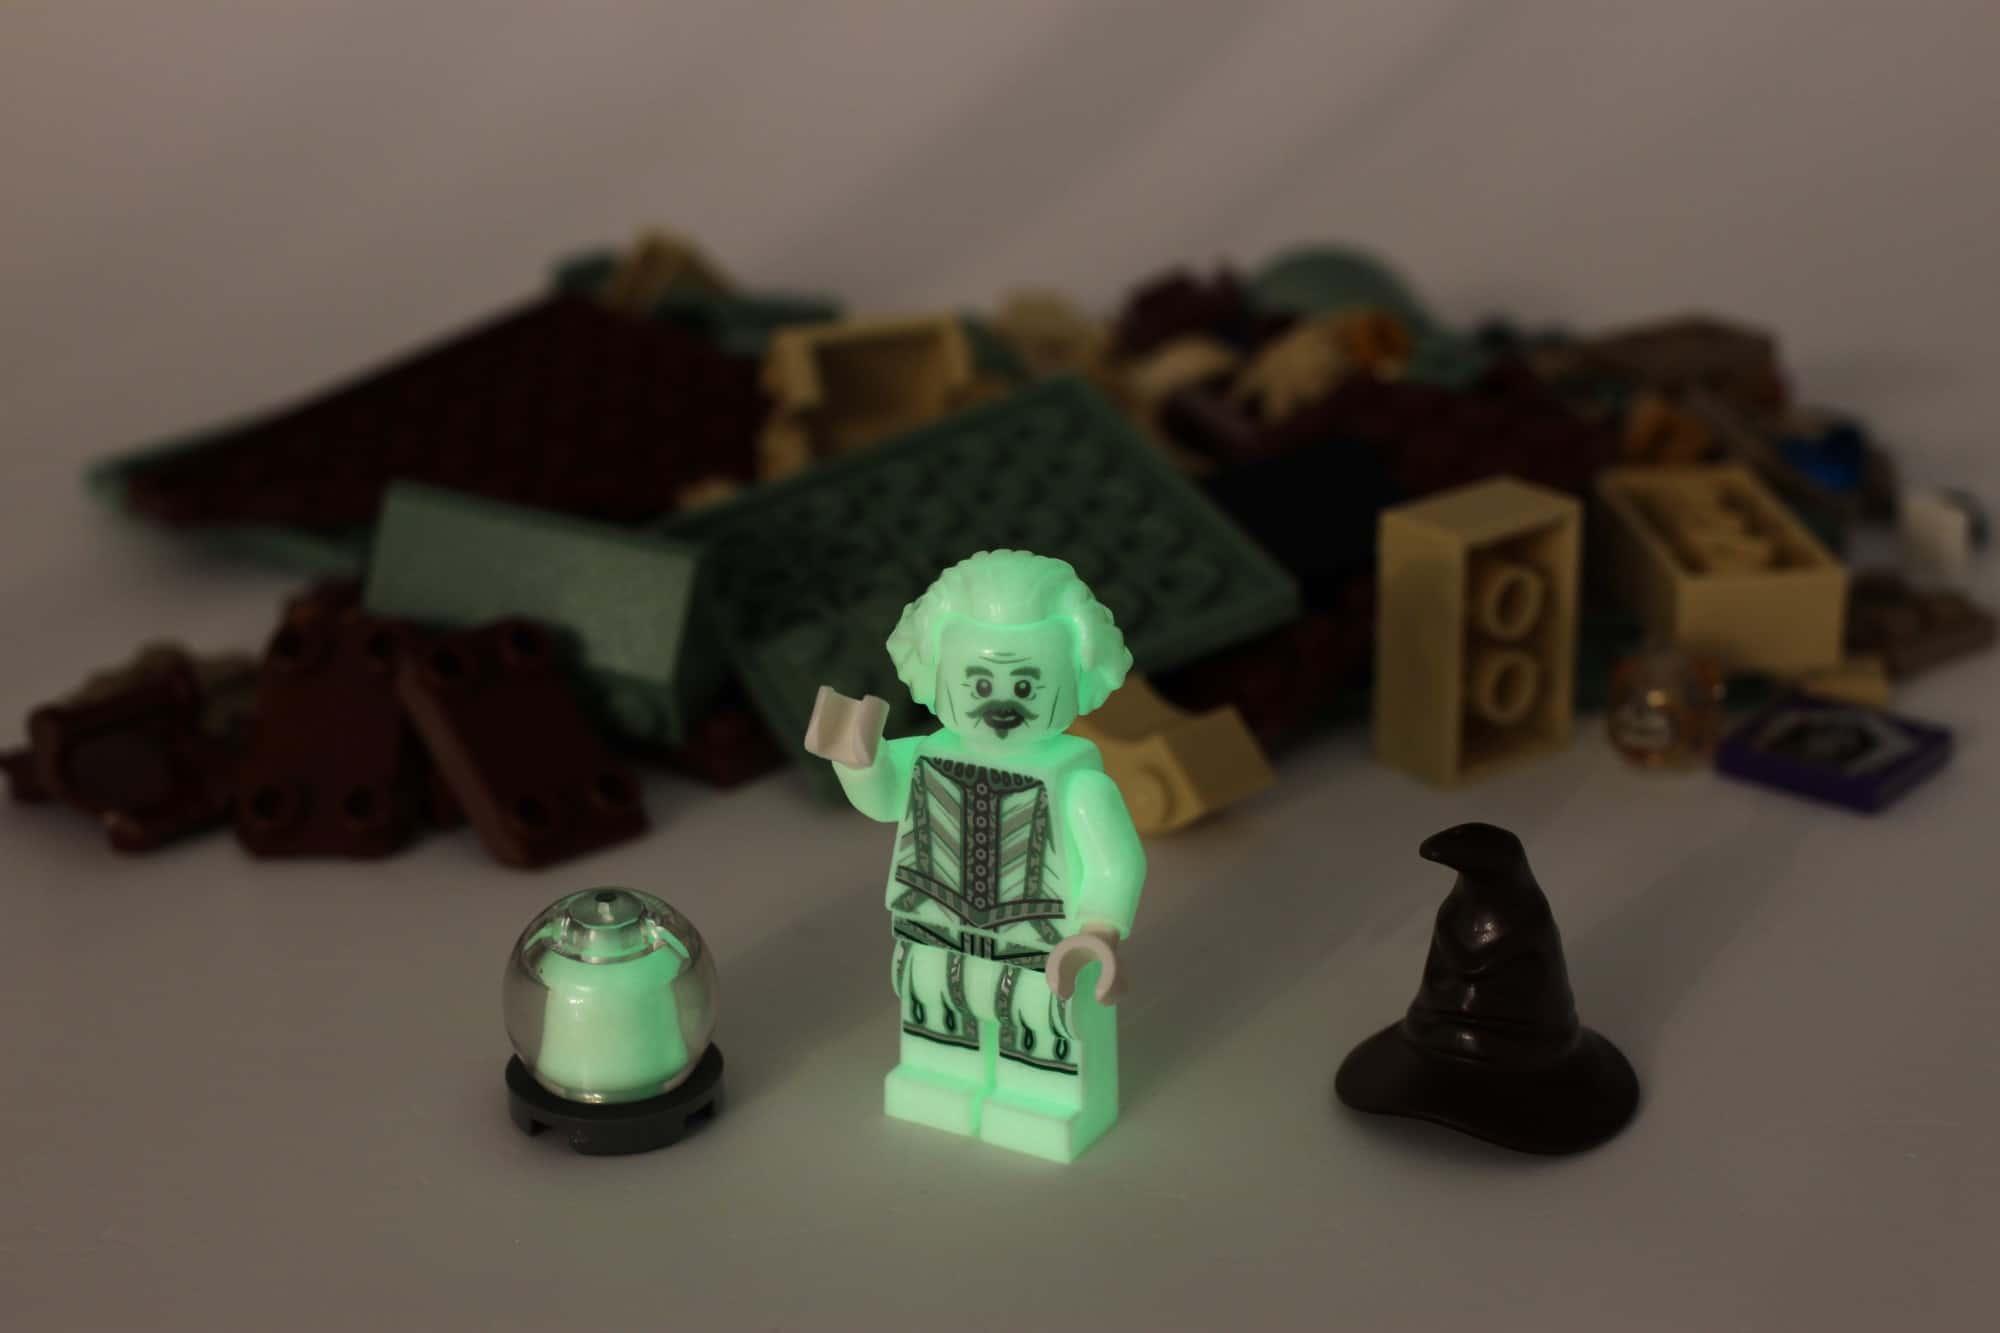 LEGO Harry Potter 76389 Hogwarts Kammer Des Schreckens Schritt 5 2